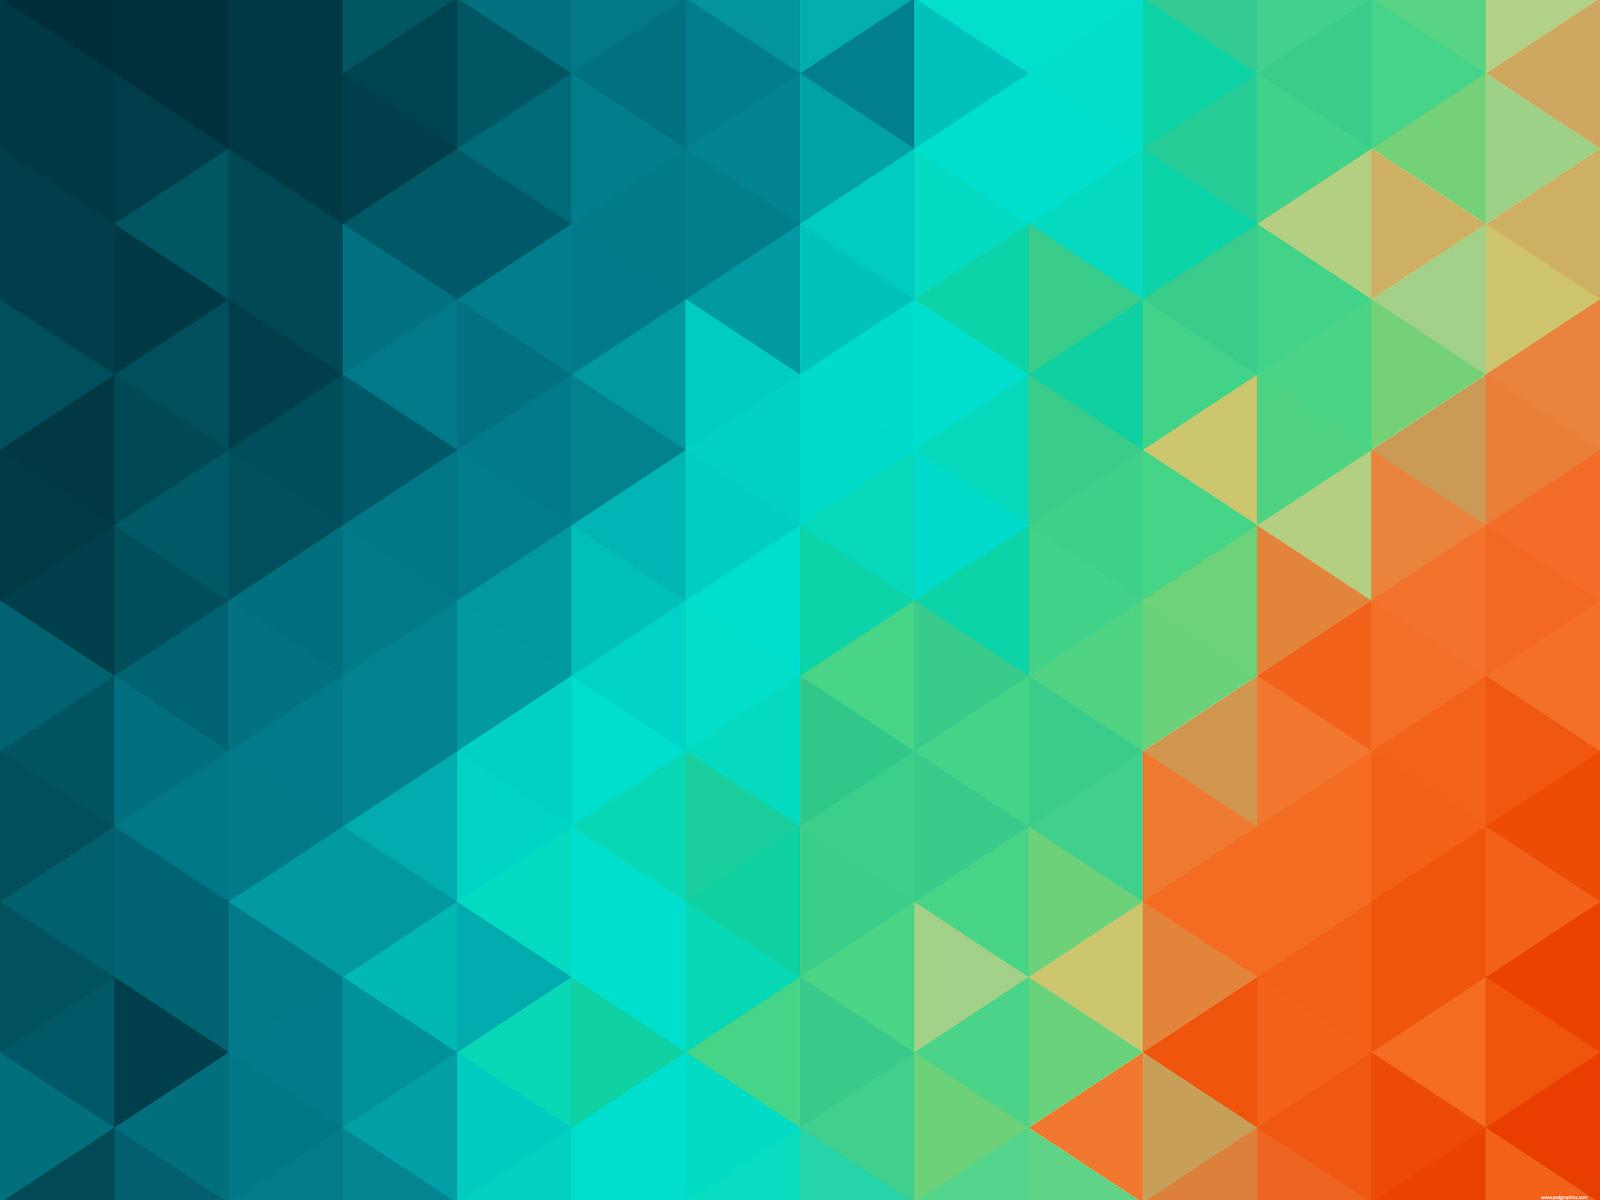 Kumpulan Contoh Desain Background Keren Nih Free Buat - Background Untuk  Pamflet Keren - 1600x1200 - Download HD Wallpaper - WallpaperTip